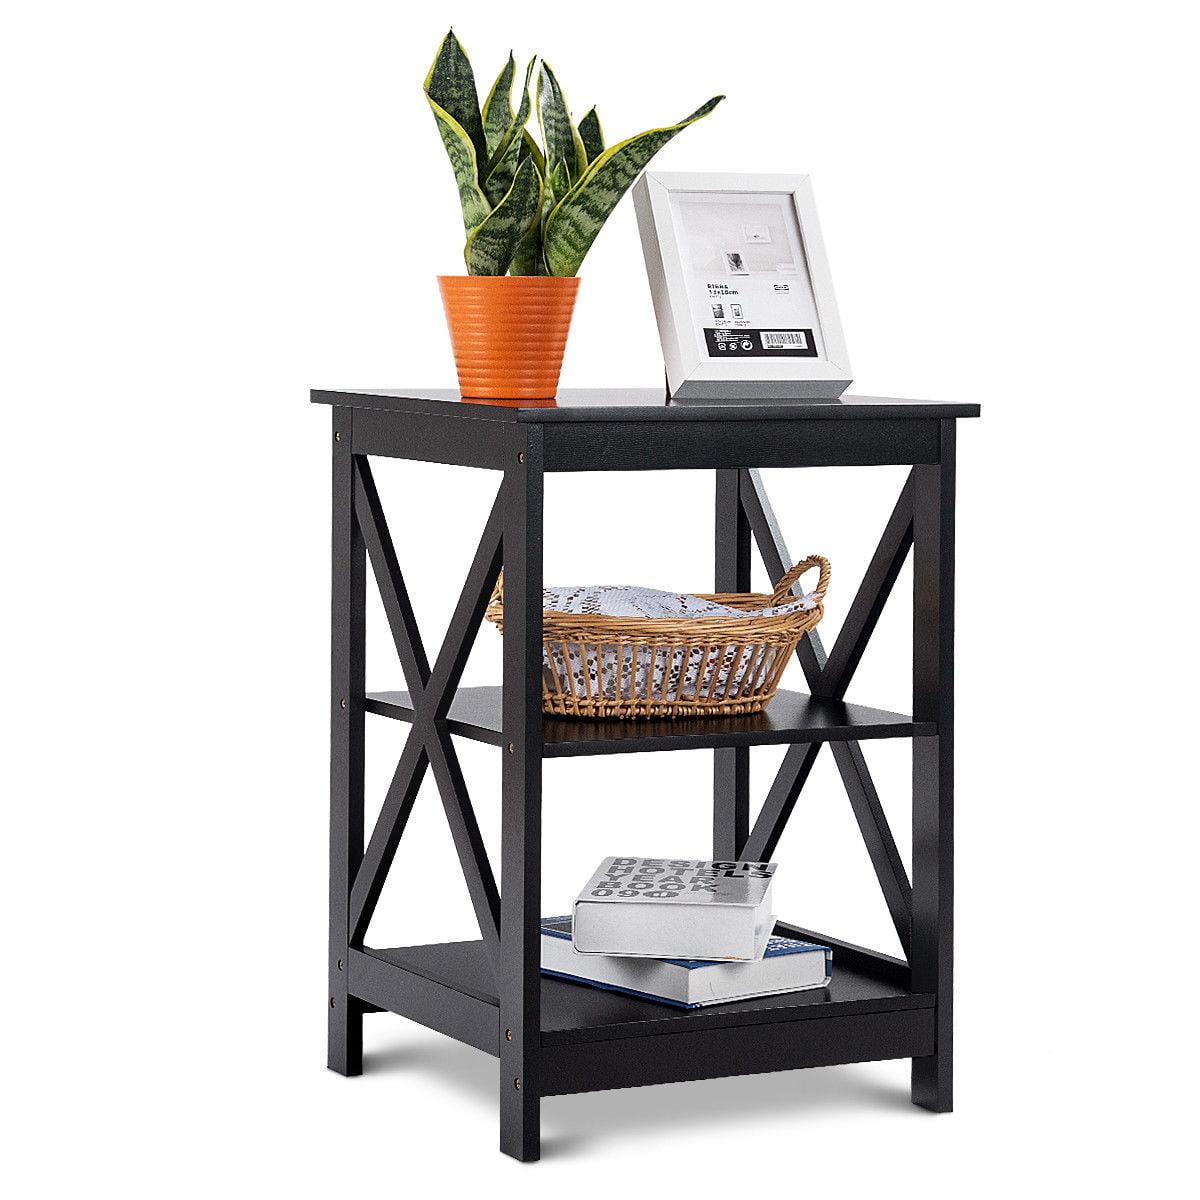 Costway 3 Tier Nightstand End Table Storage Display Shelf Living Room Furniture Black Walmart Canada